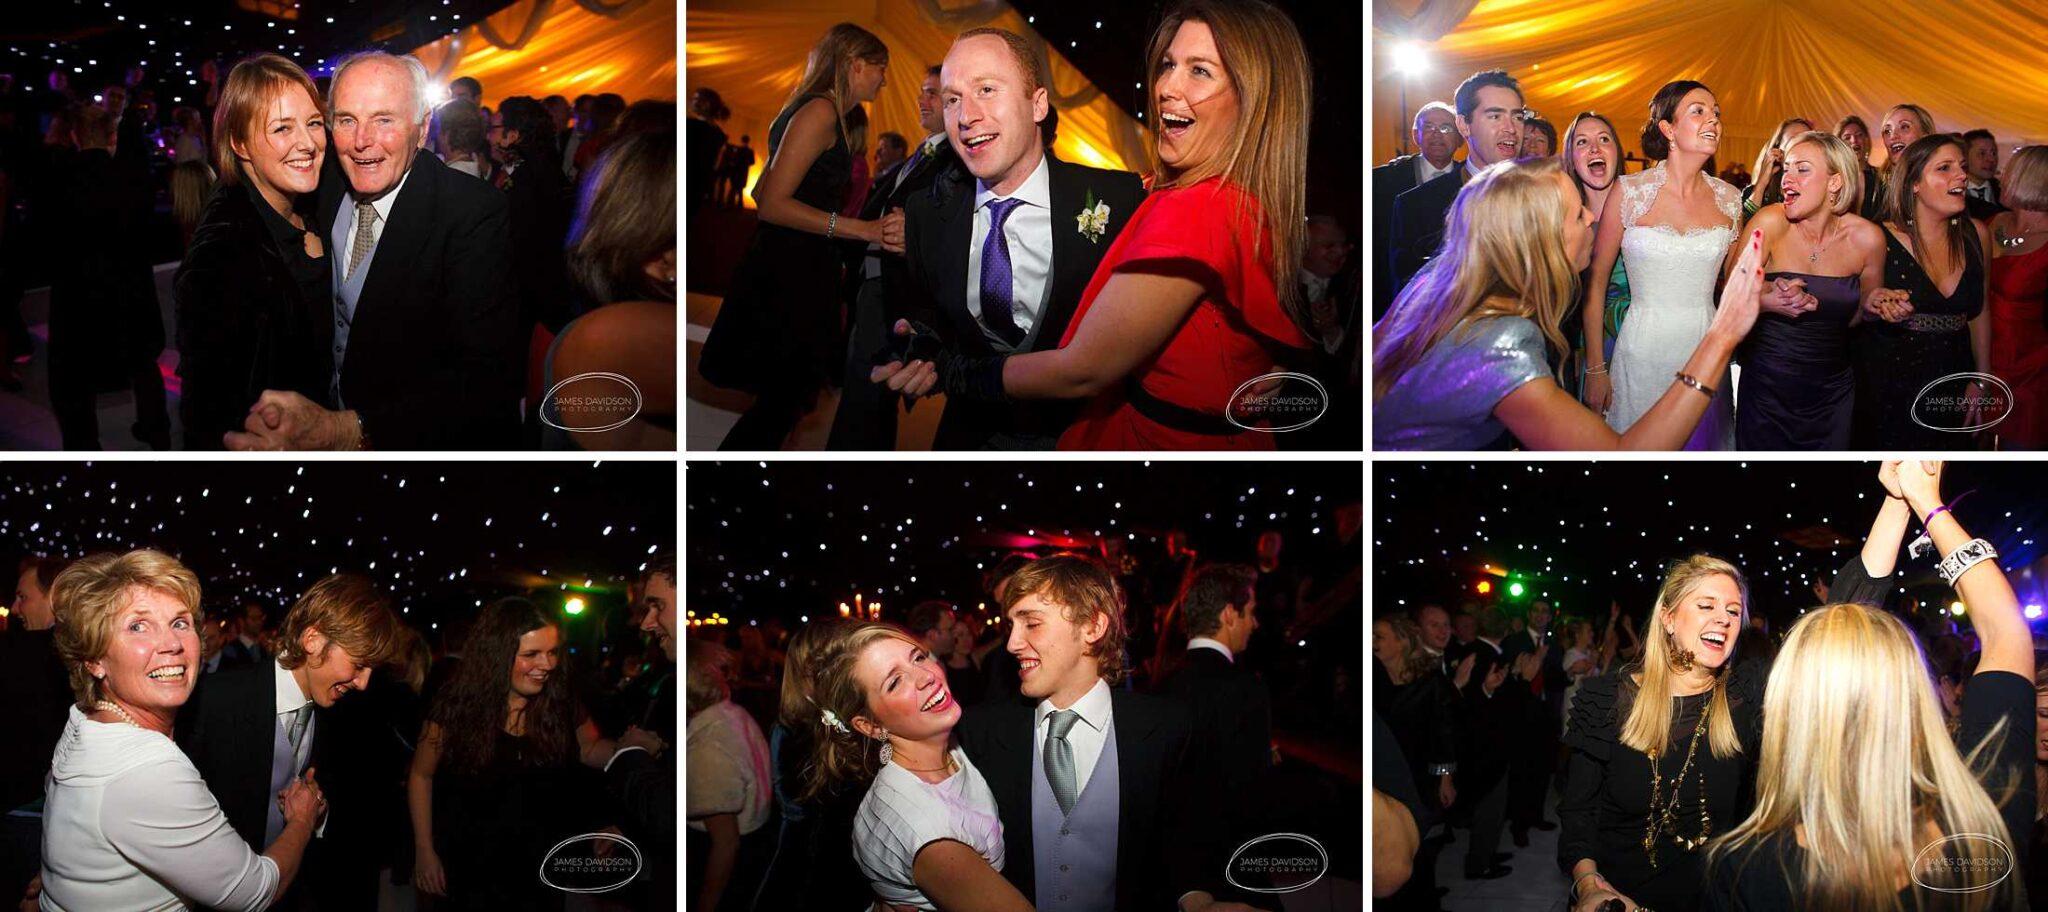 huddersfield-wedding-photography-053